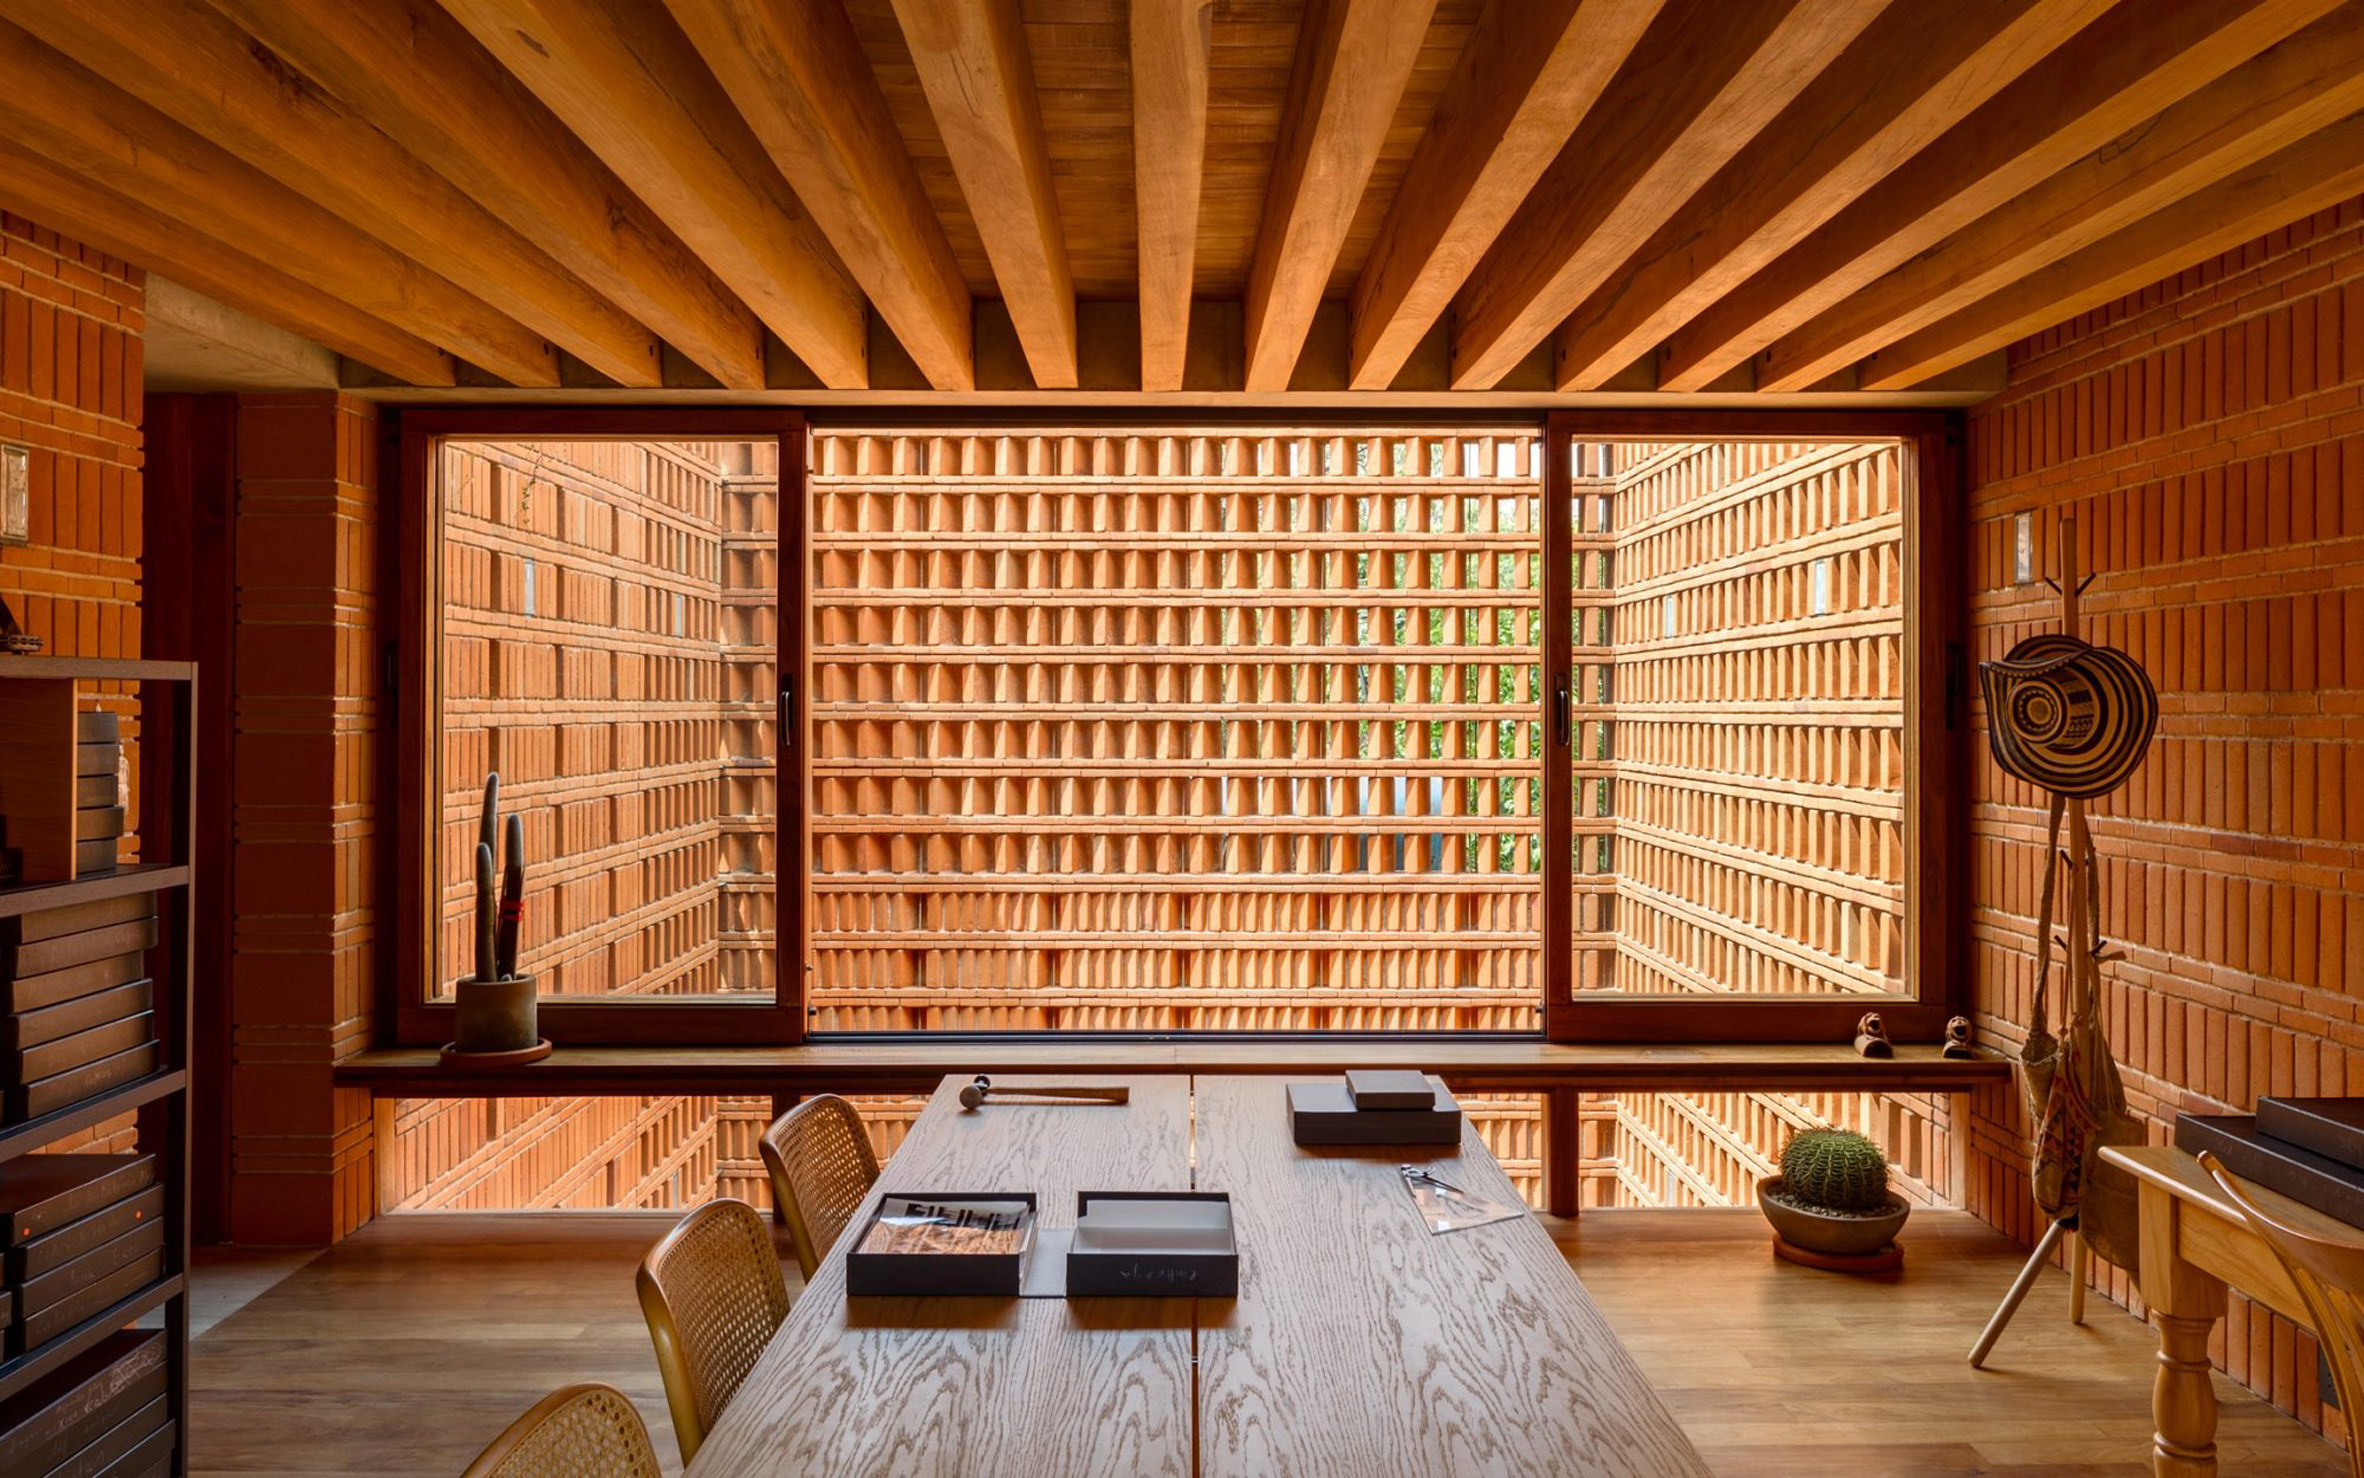 Iturbide Studio by Taller Mauricio Rocha and Gabriela Carillo